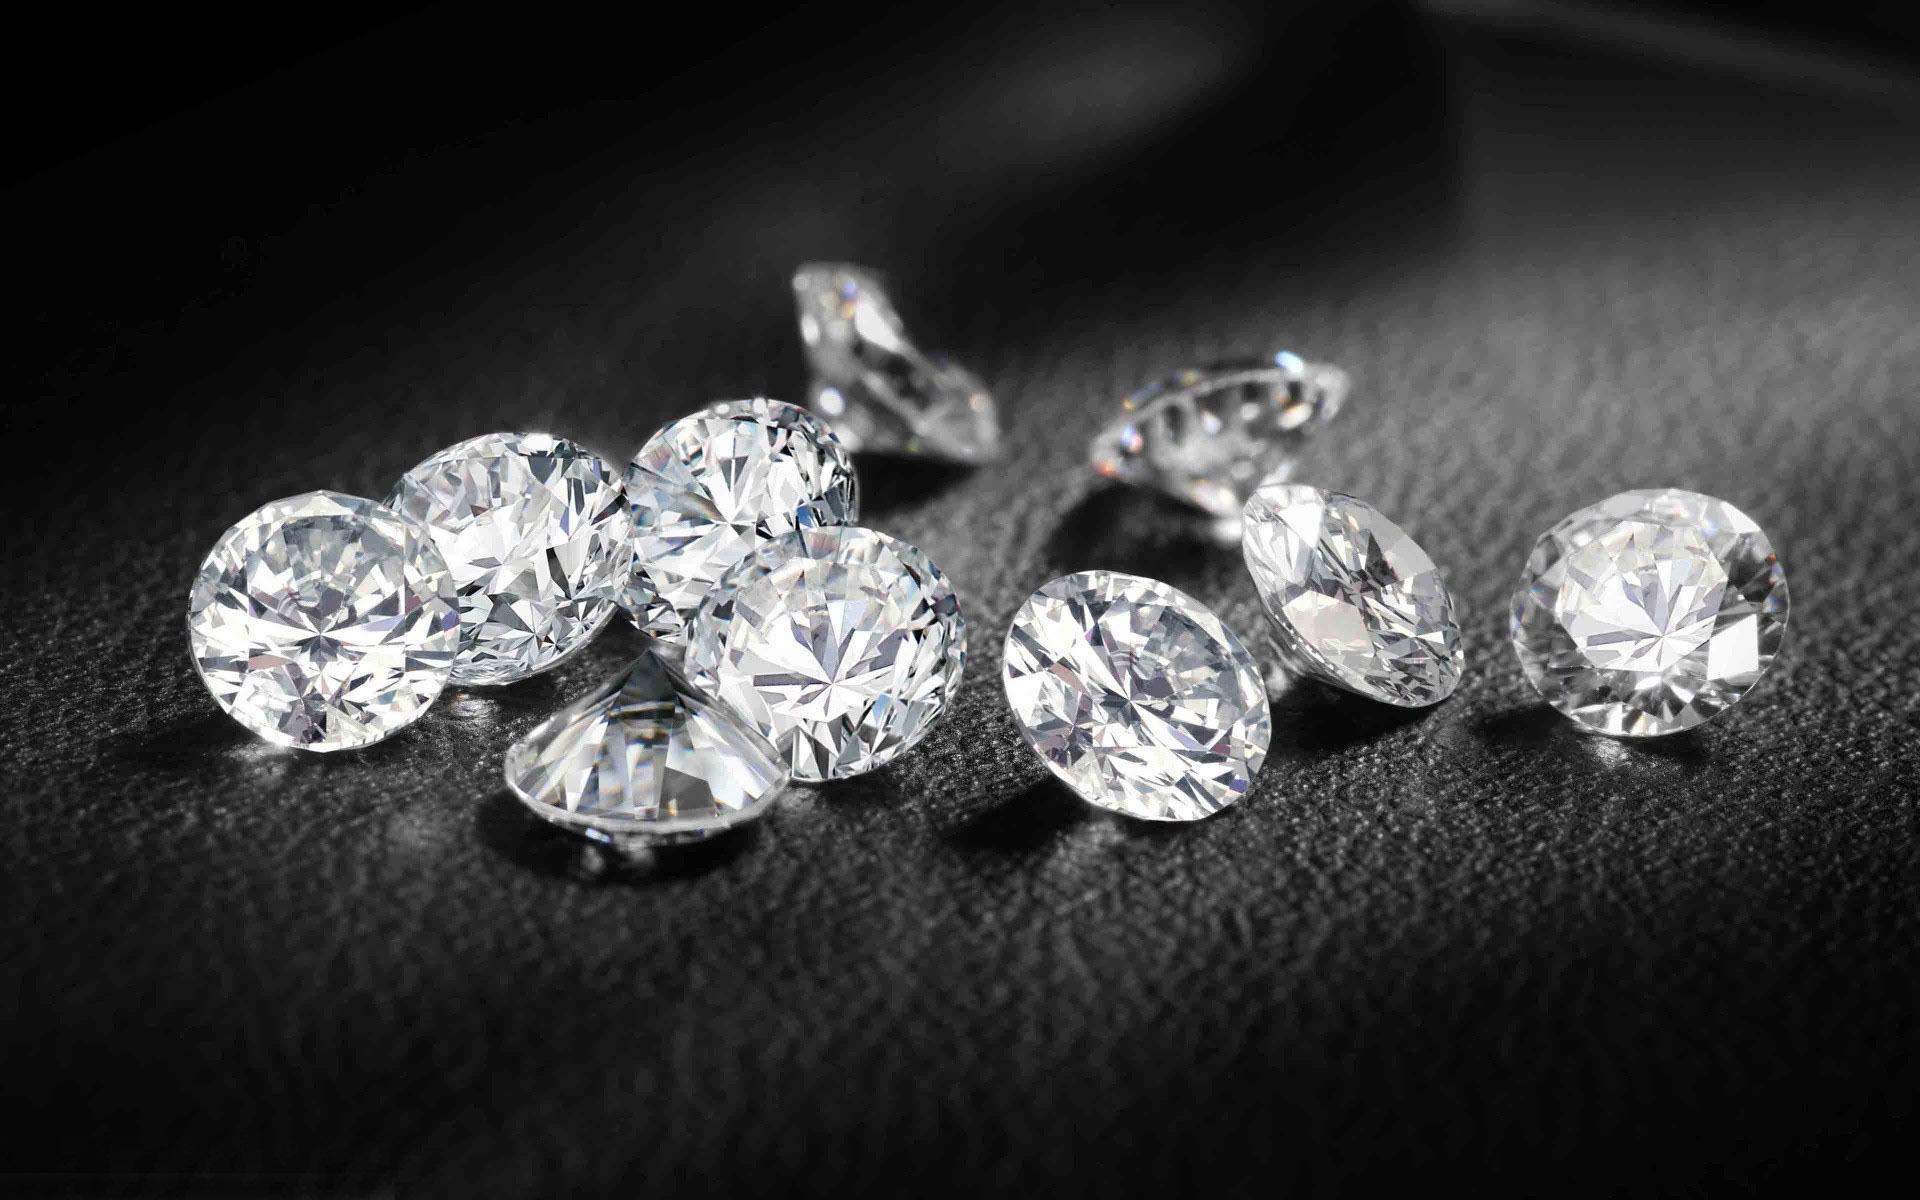 diamonds wallpaper 1920x1200